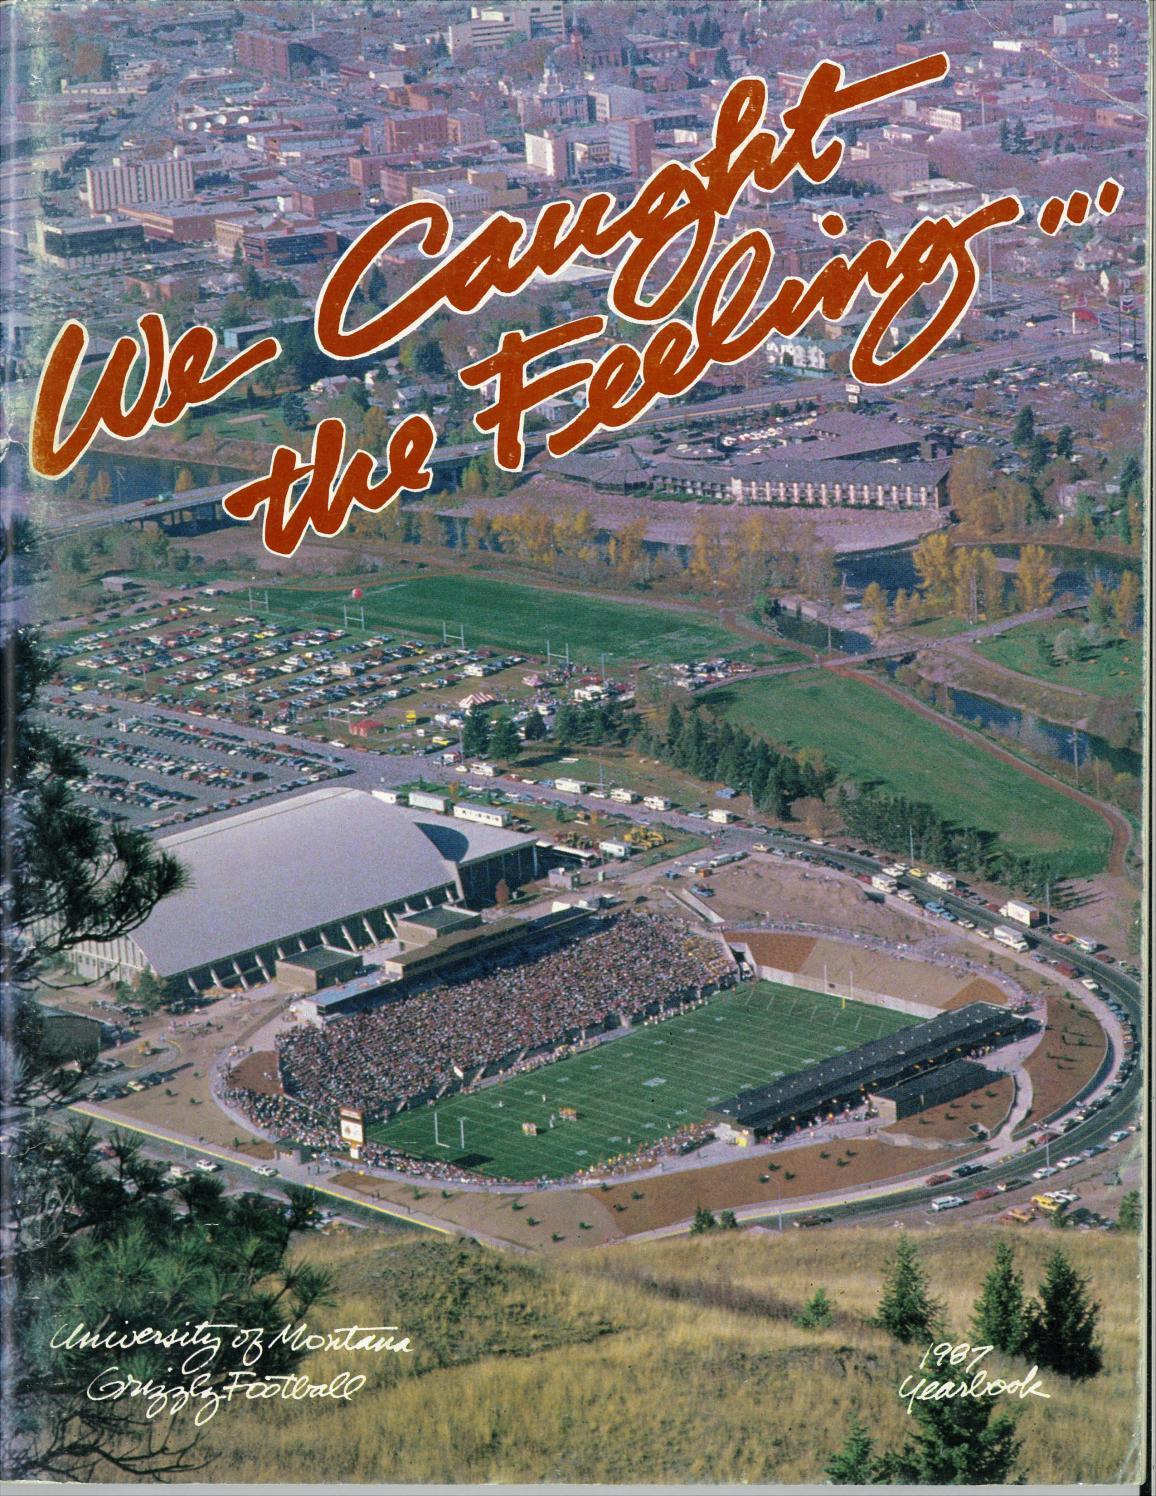 1987 Football Media Guide by University of Montana Athletics